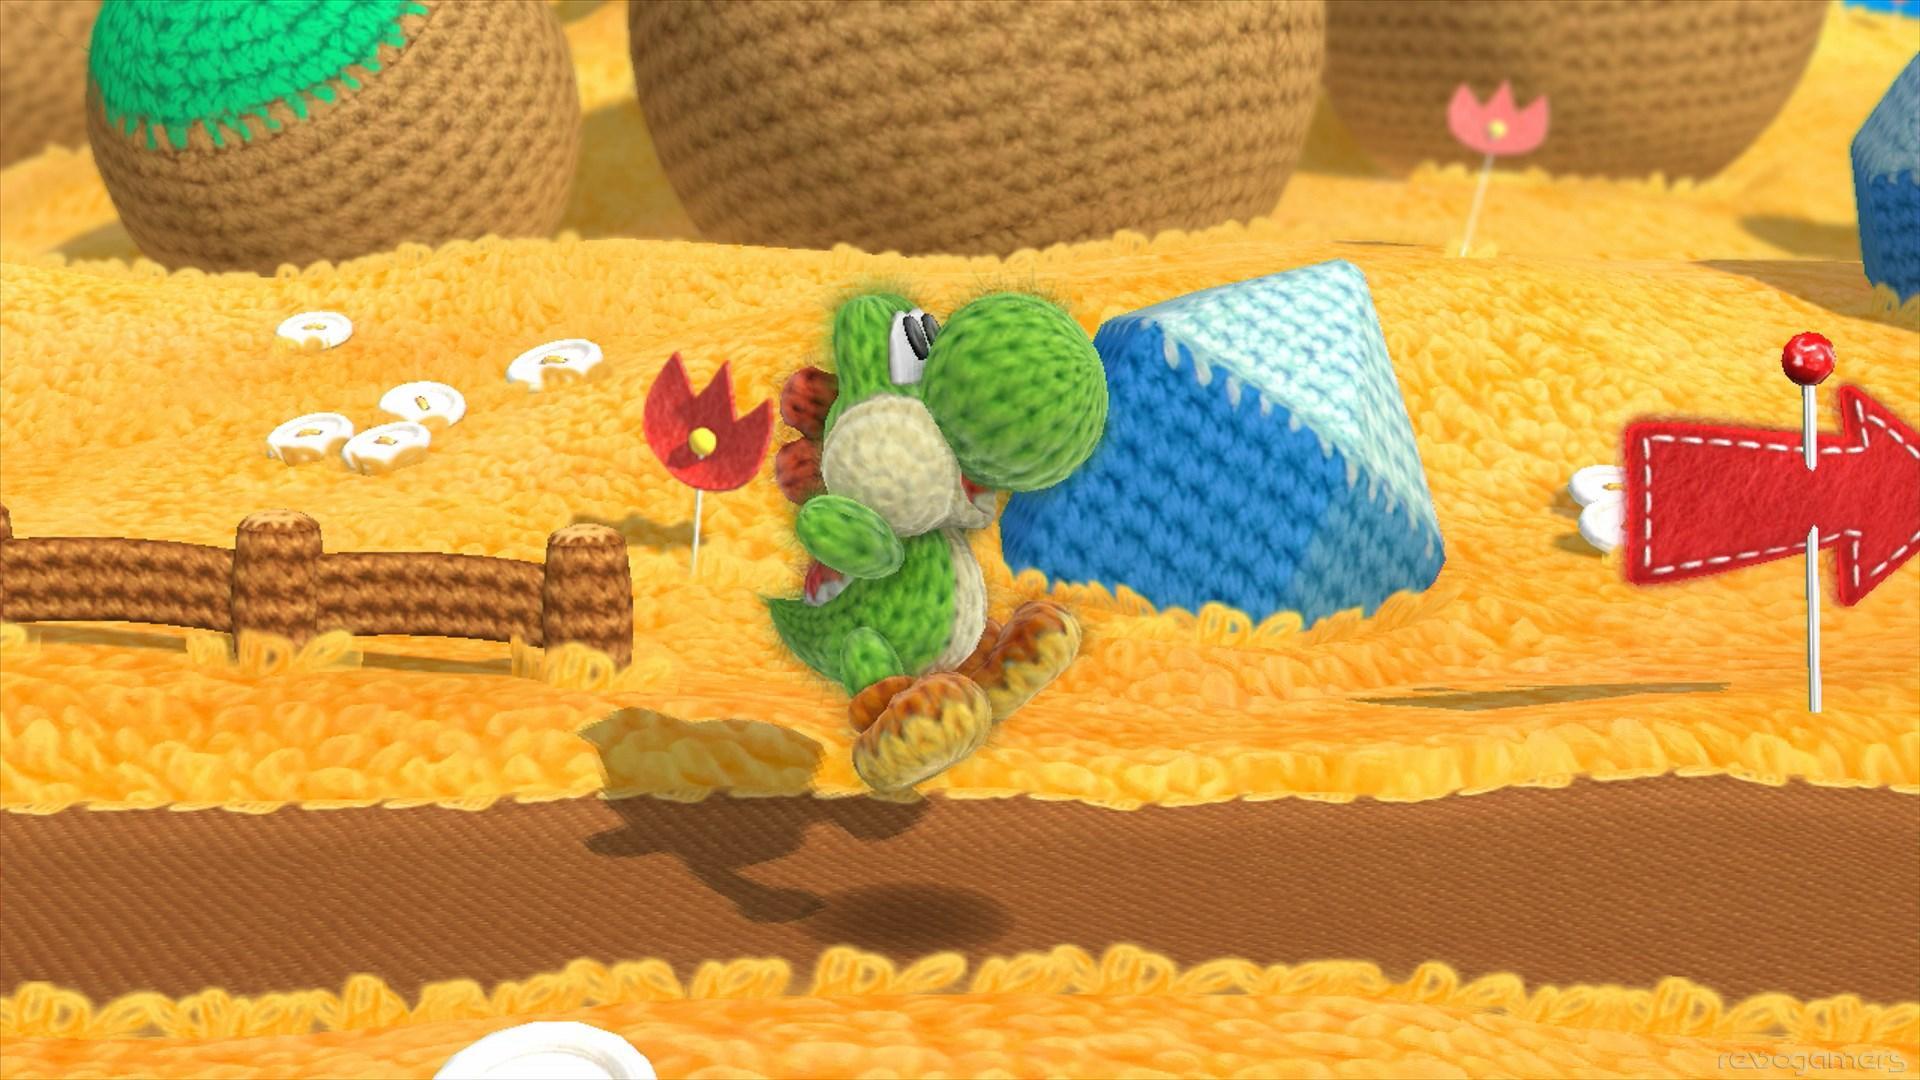 Yoshi´s Woolly World Wii U - Avance